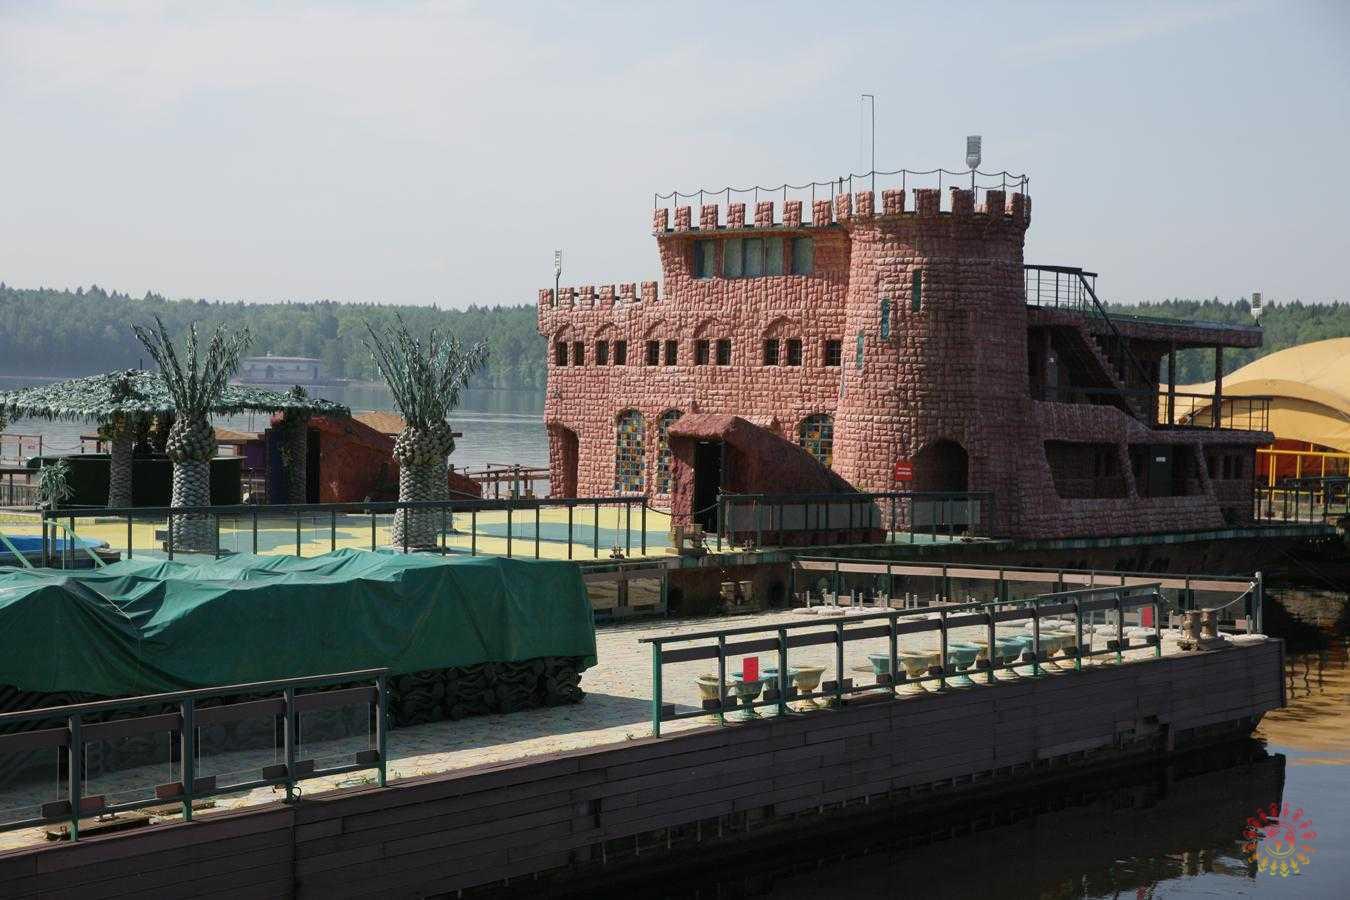 Загадочный квест Fort Boyard на острове Малибу 52 Москва